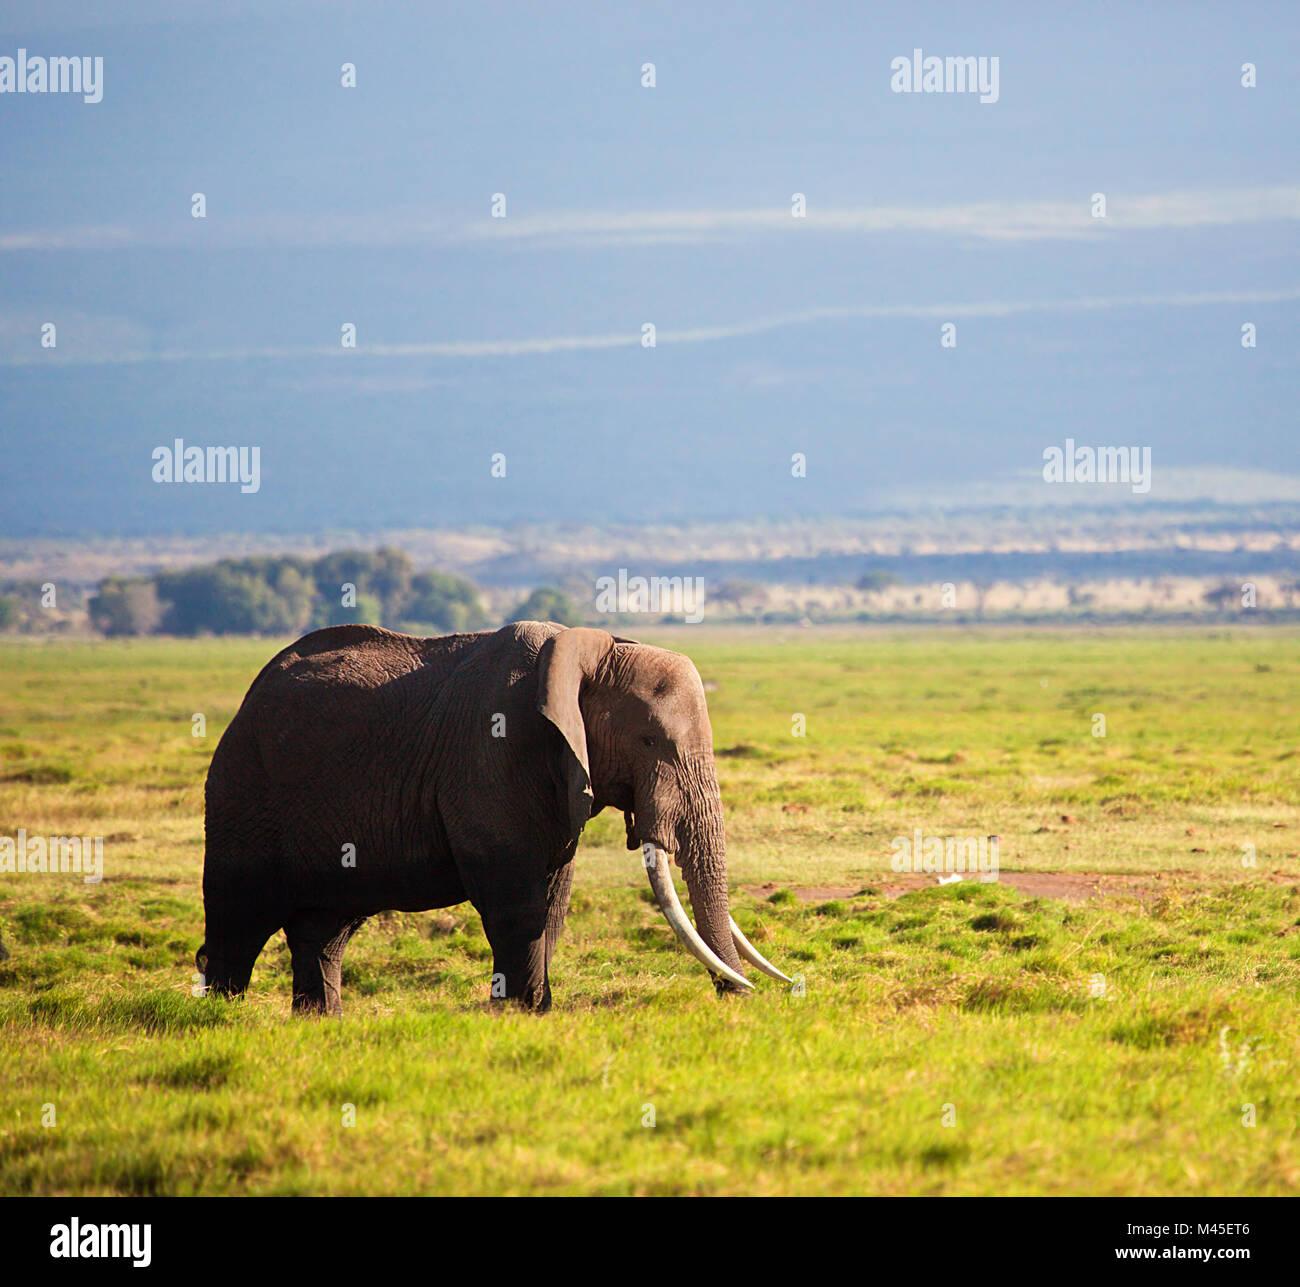 Elefanti sulla savana. Safari in Amboseli, Kenya, Africa Foto Stock